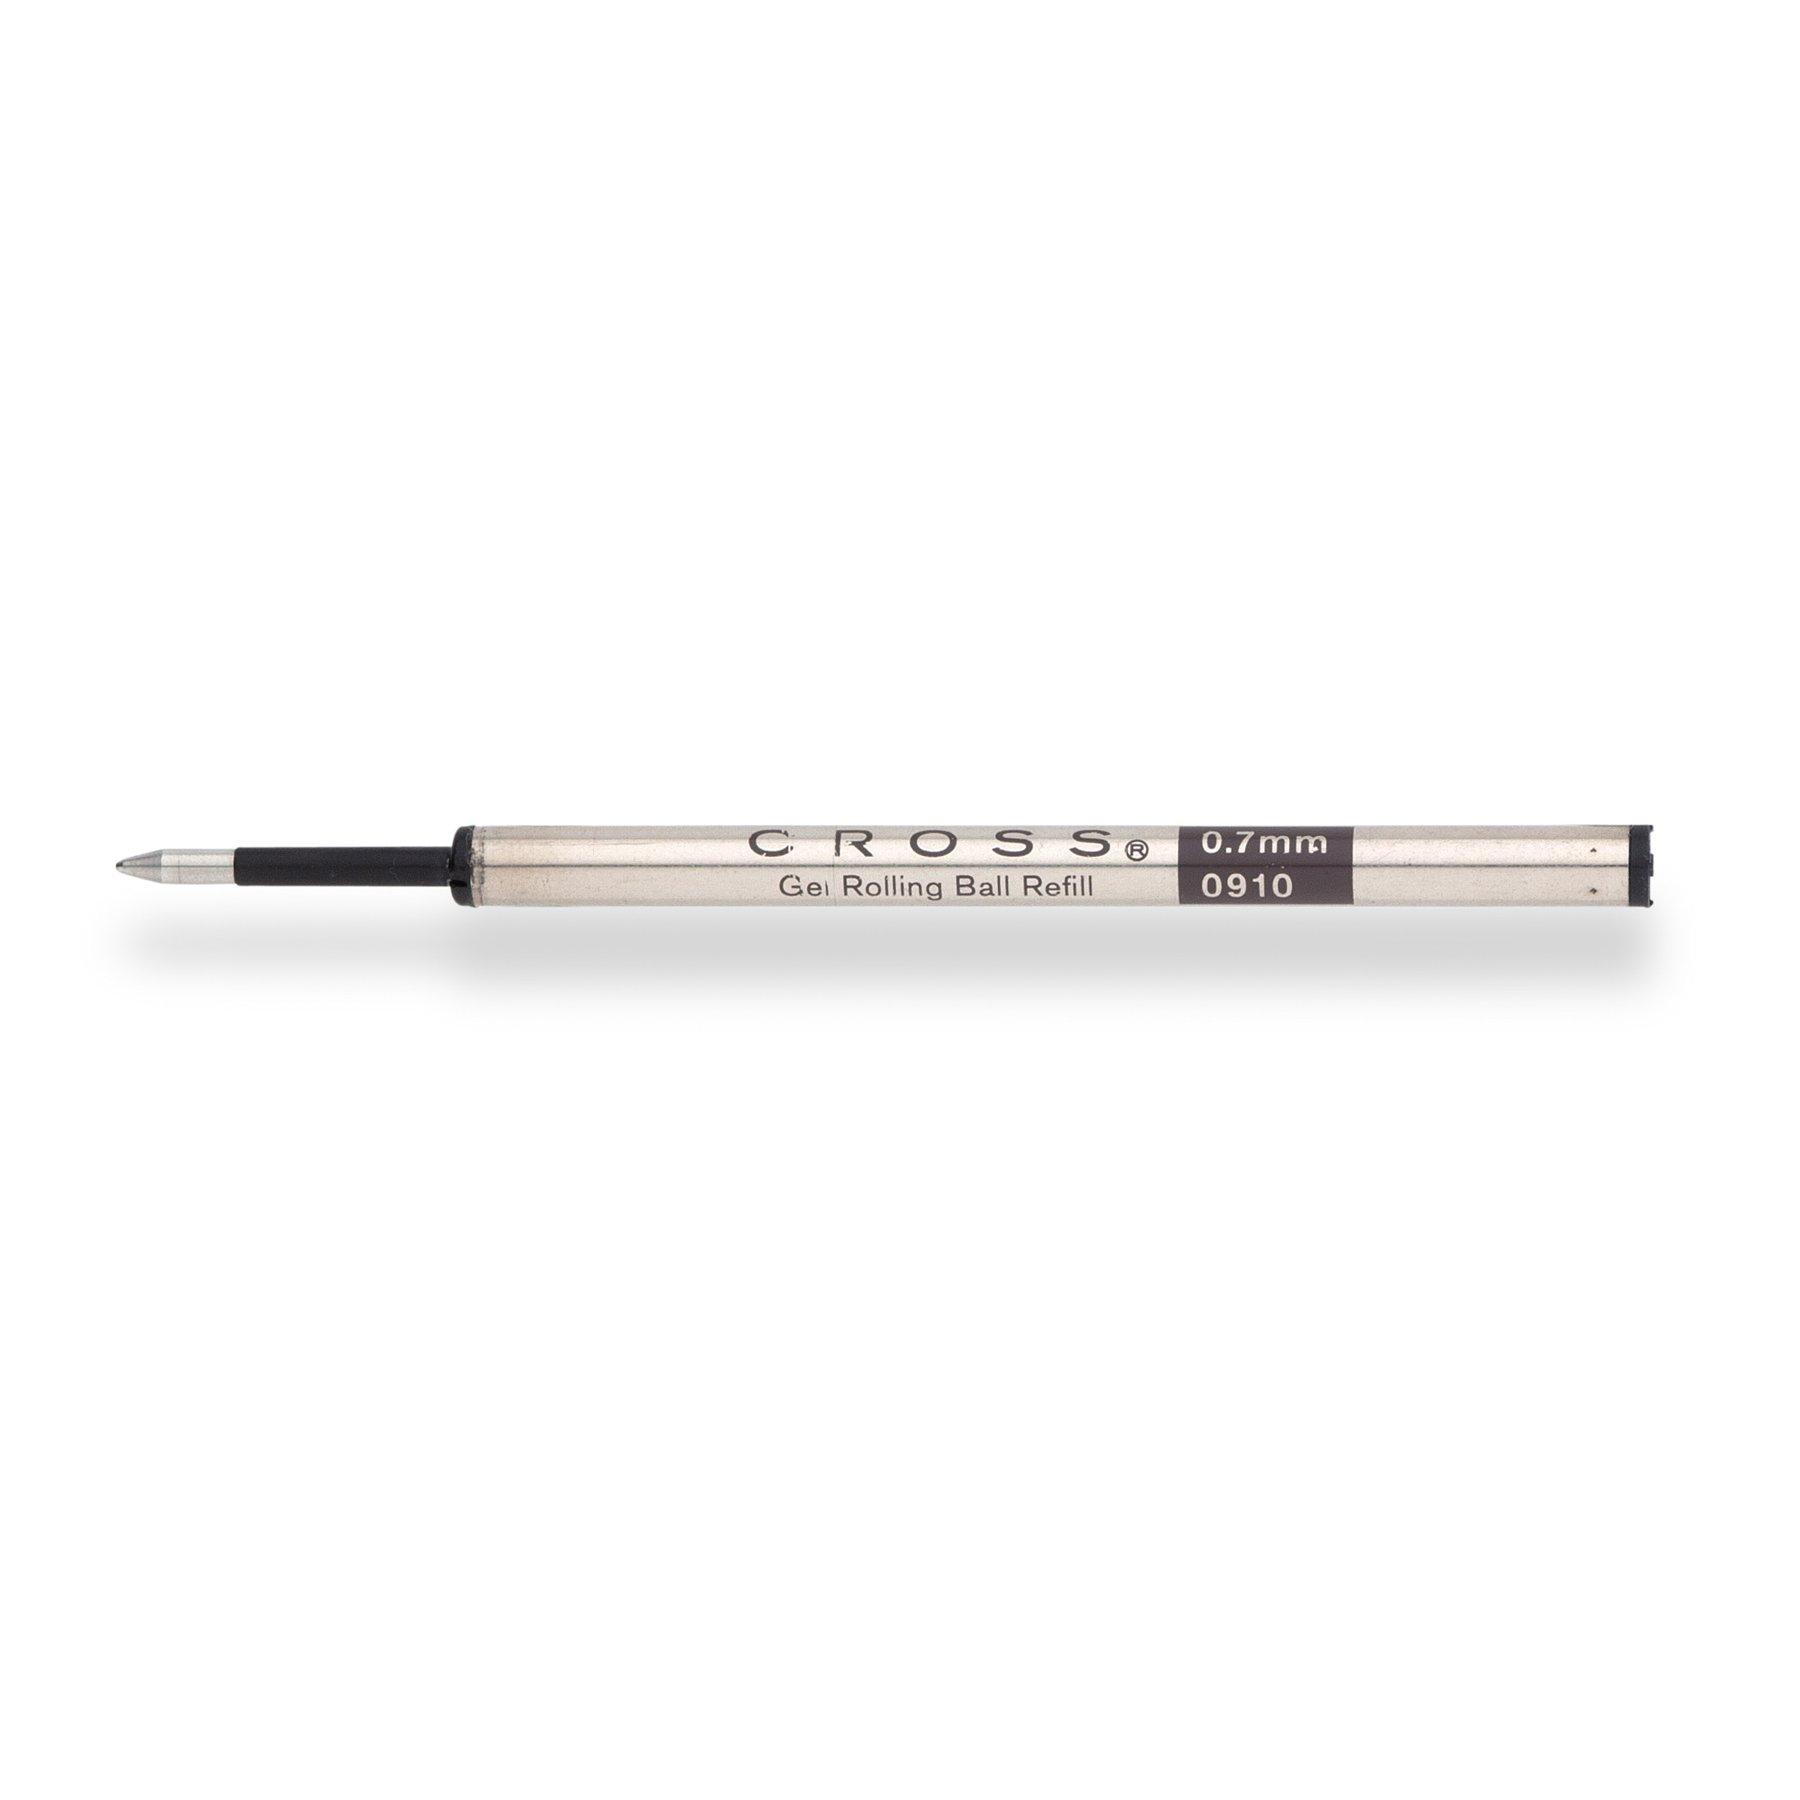 2 Pk Cross Slim Gel Black Rolling Ball Refills 8910-1 NEW